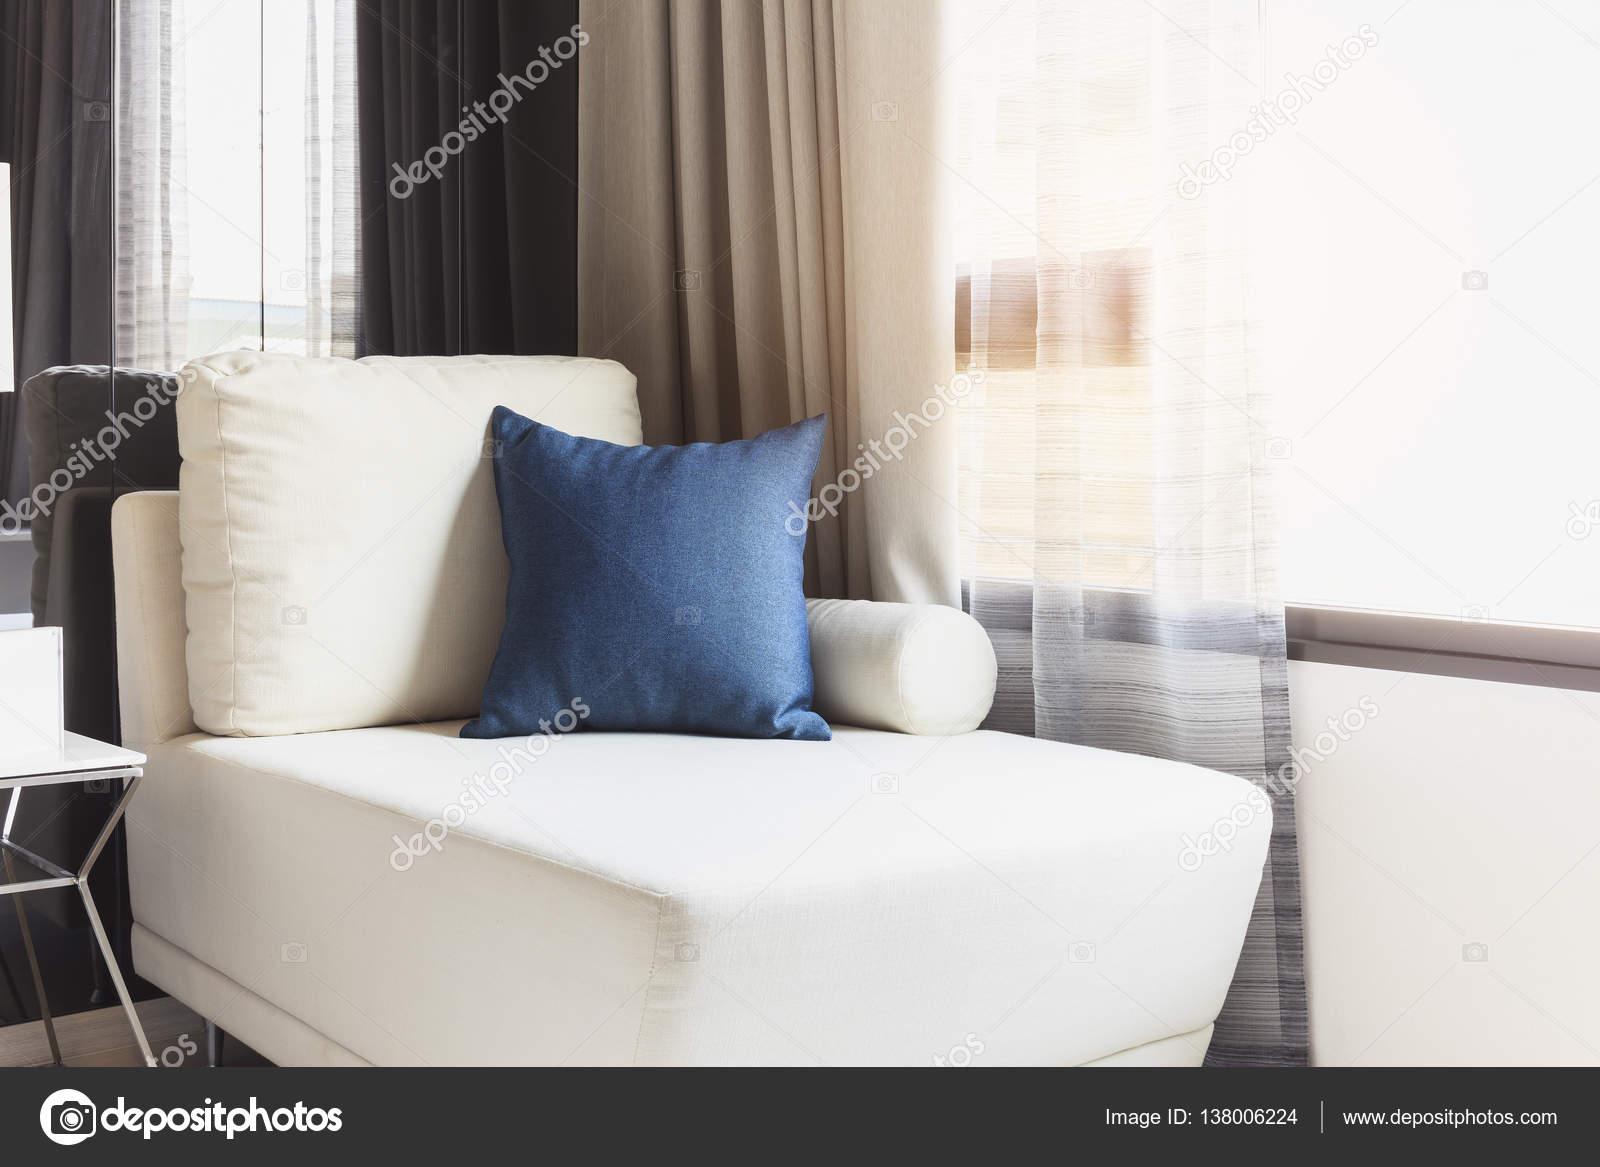 Sitz Sofa mit Kissen moderne Home Interior Dekoration — Stockfoto ...